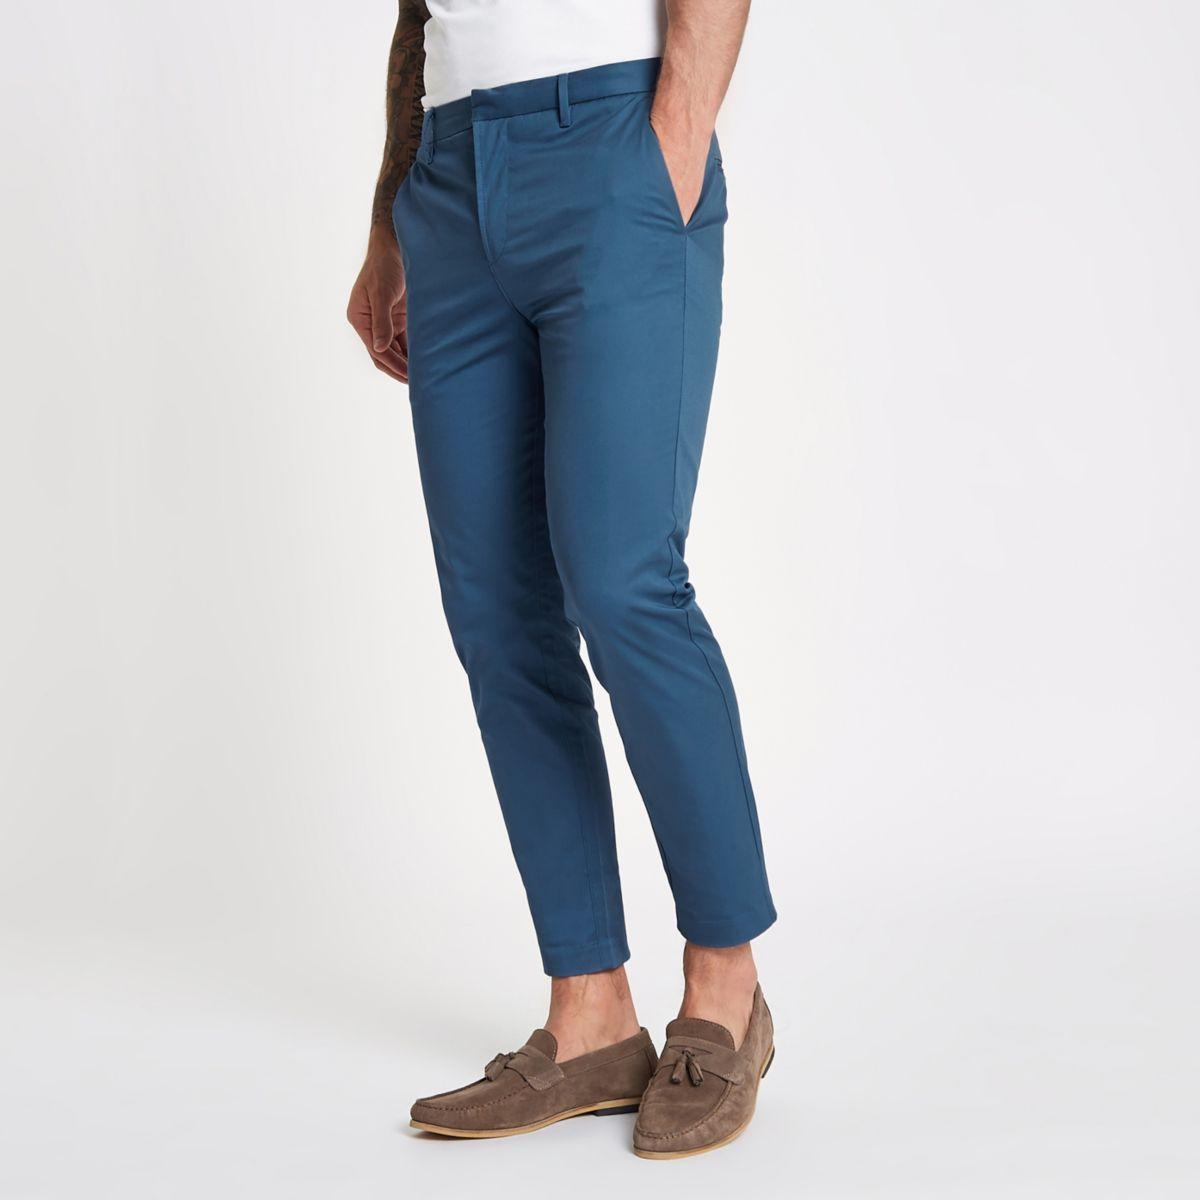 Blue cropped skinny chino pants